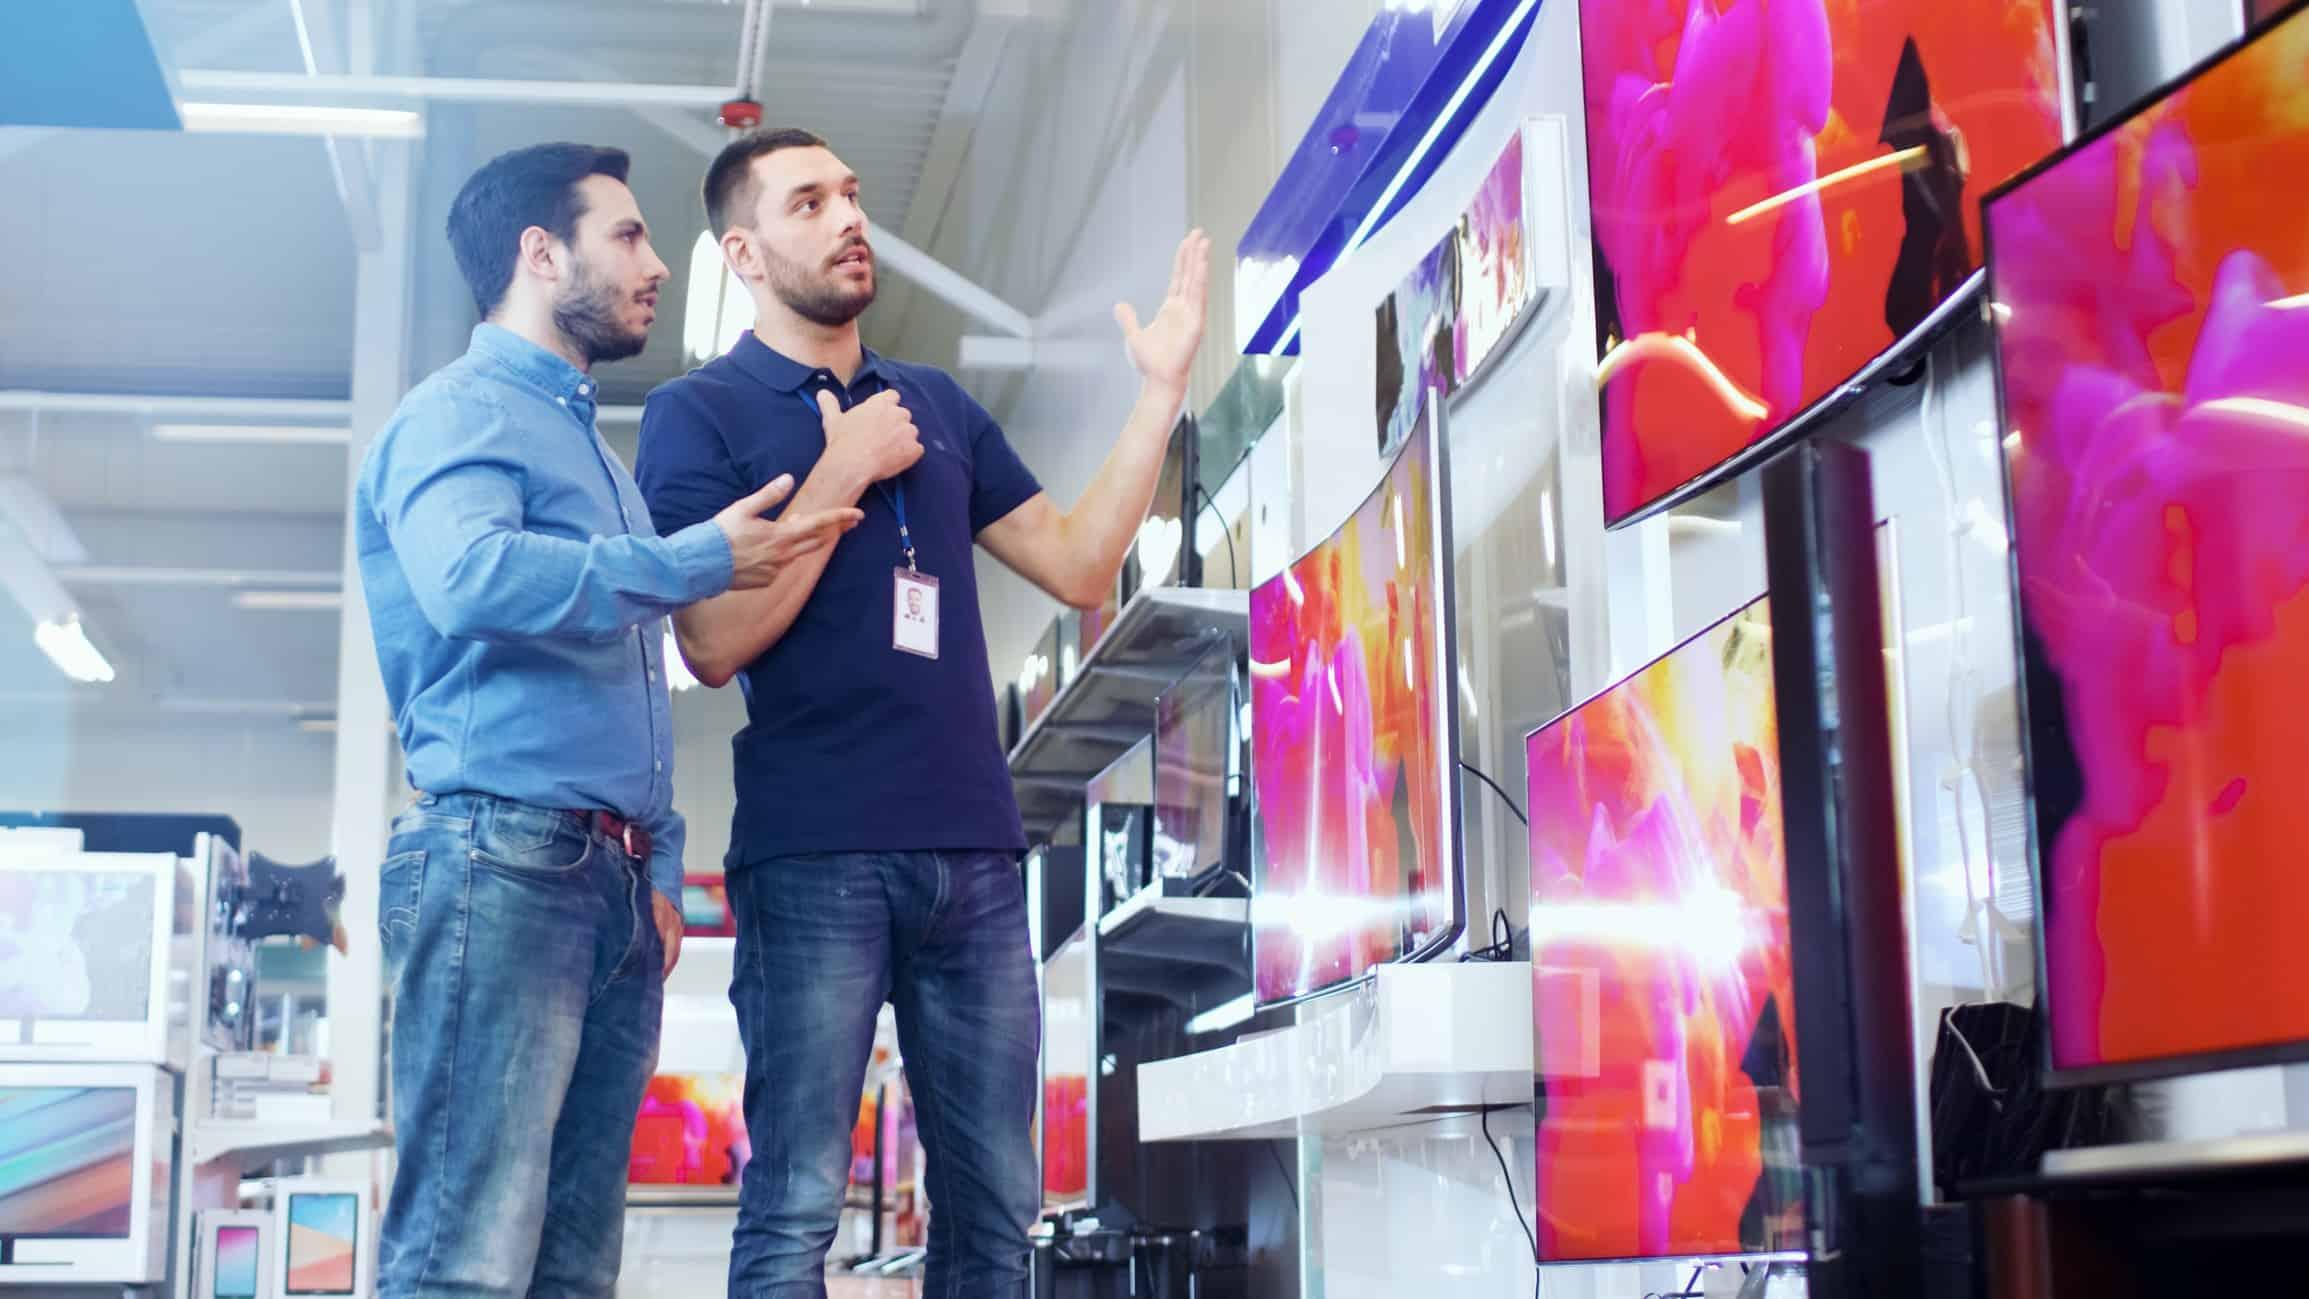 man helping customer looking at tvs in store signifying jb hi-fi share price